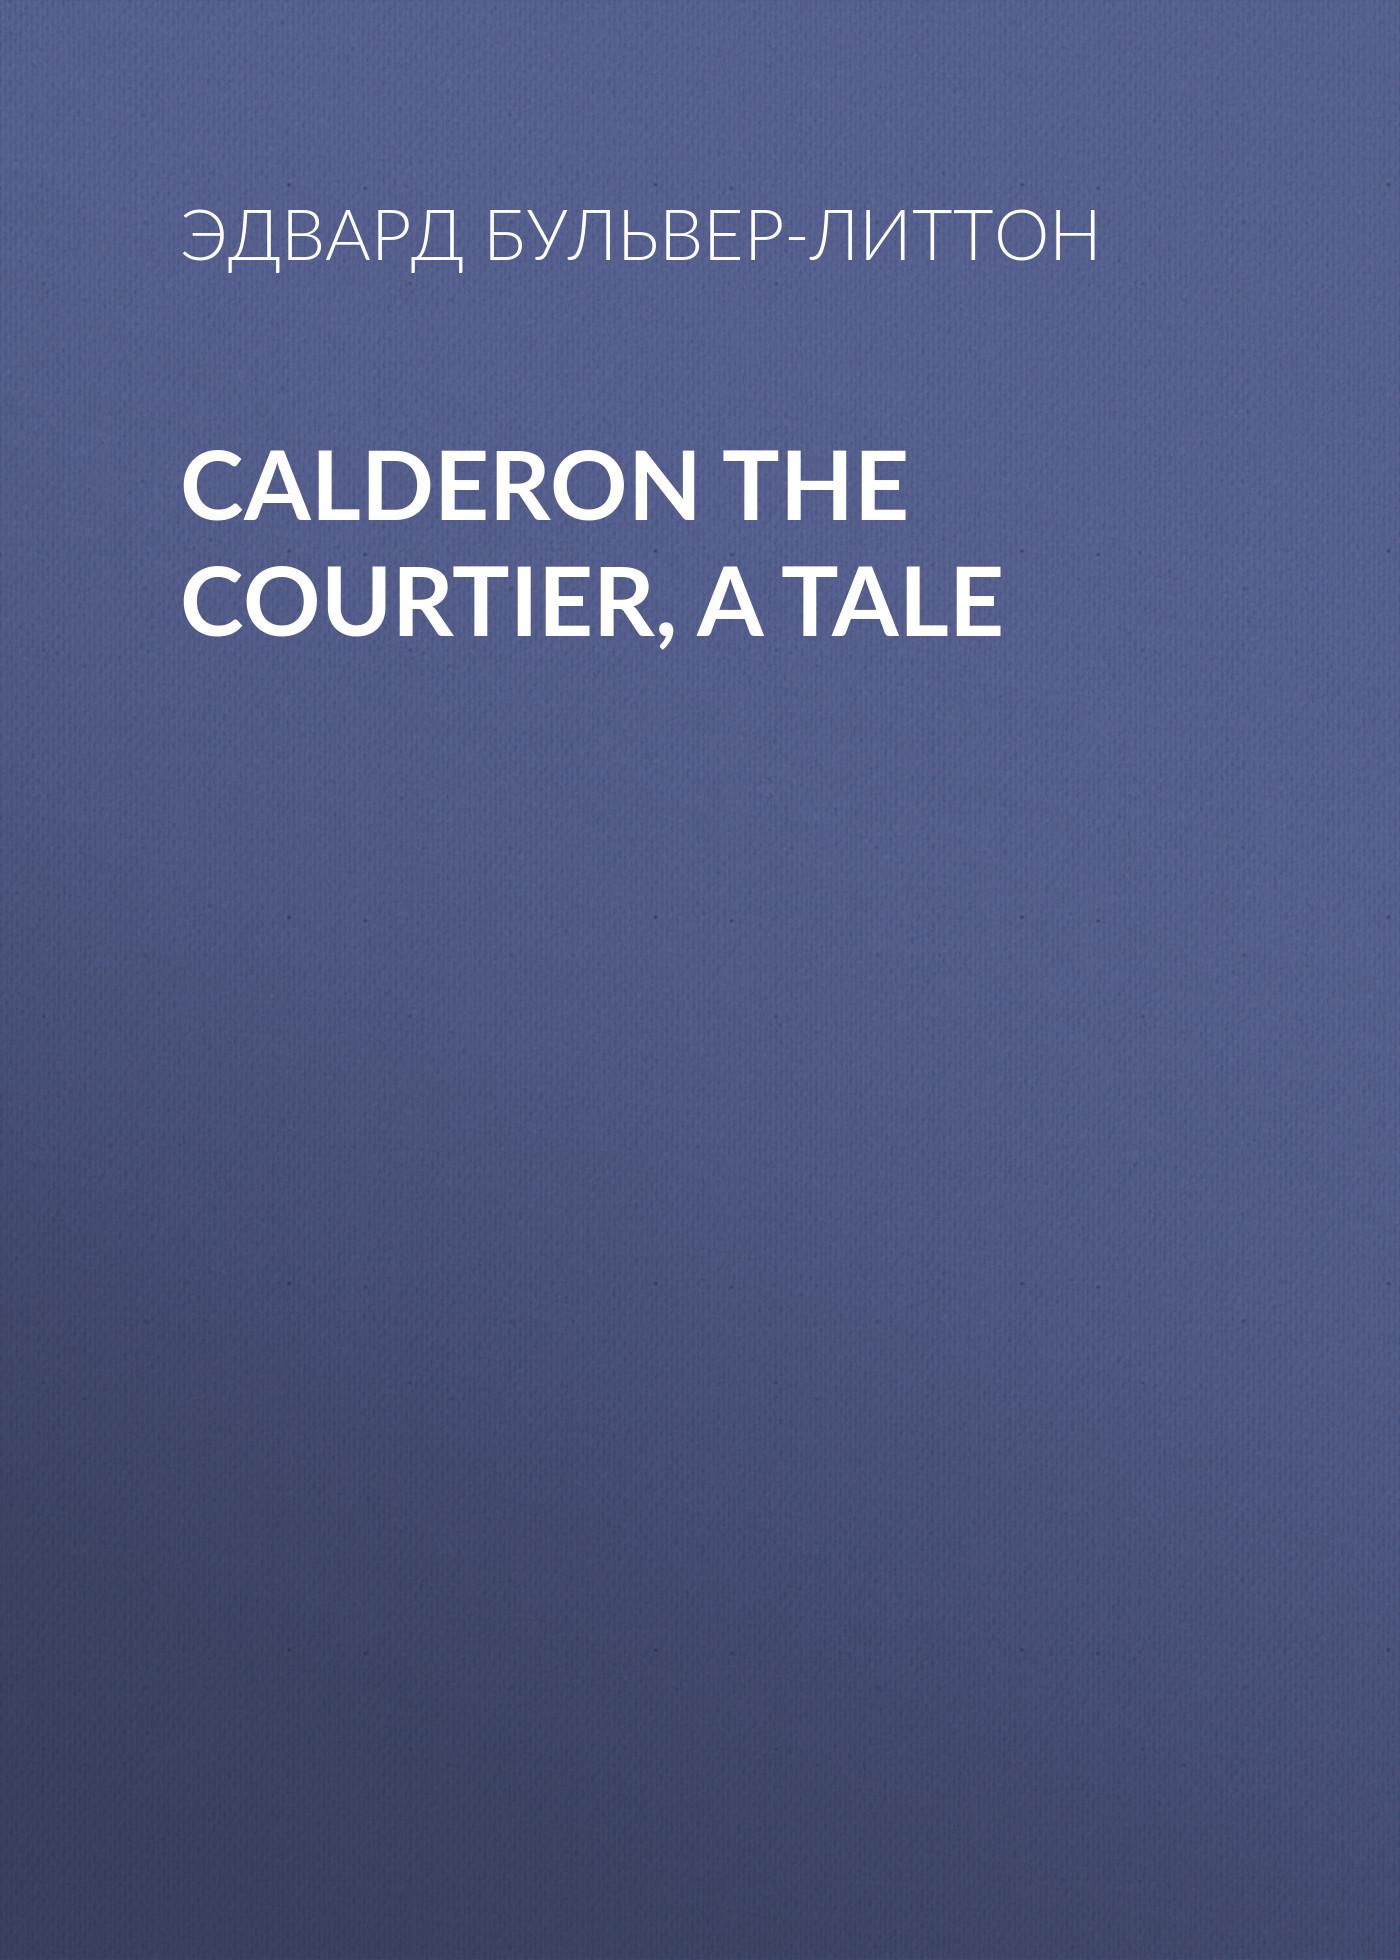 Эдвард Бульвер-Литтон Calderon the Courtier, a Tale